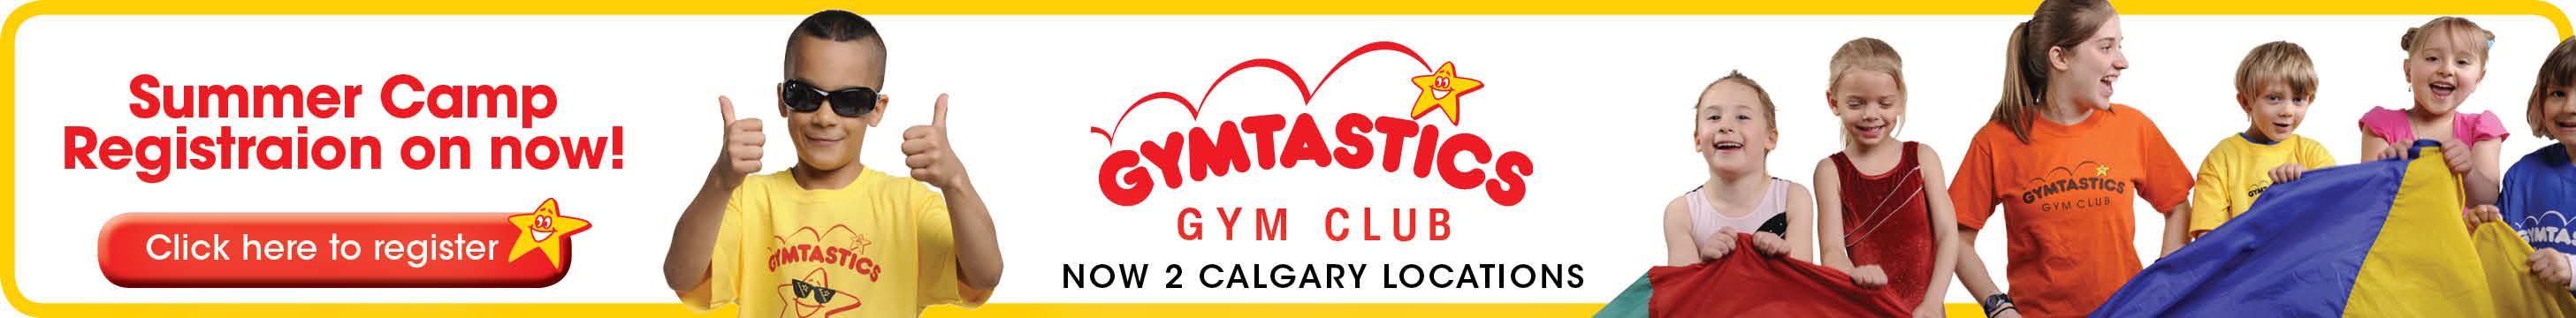 Gymtastics May 2016